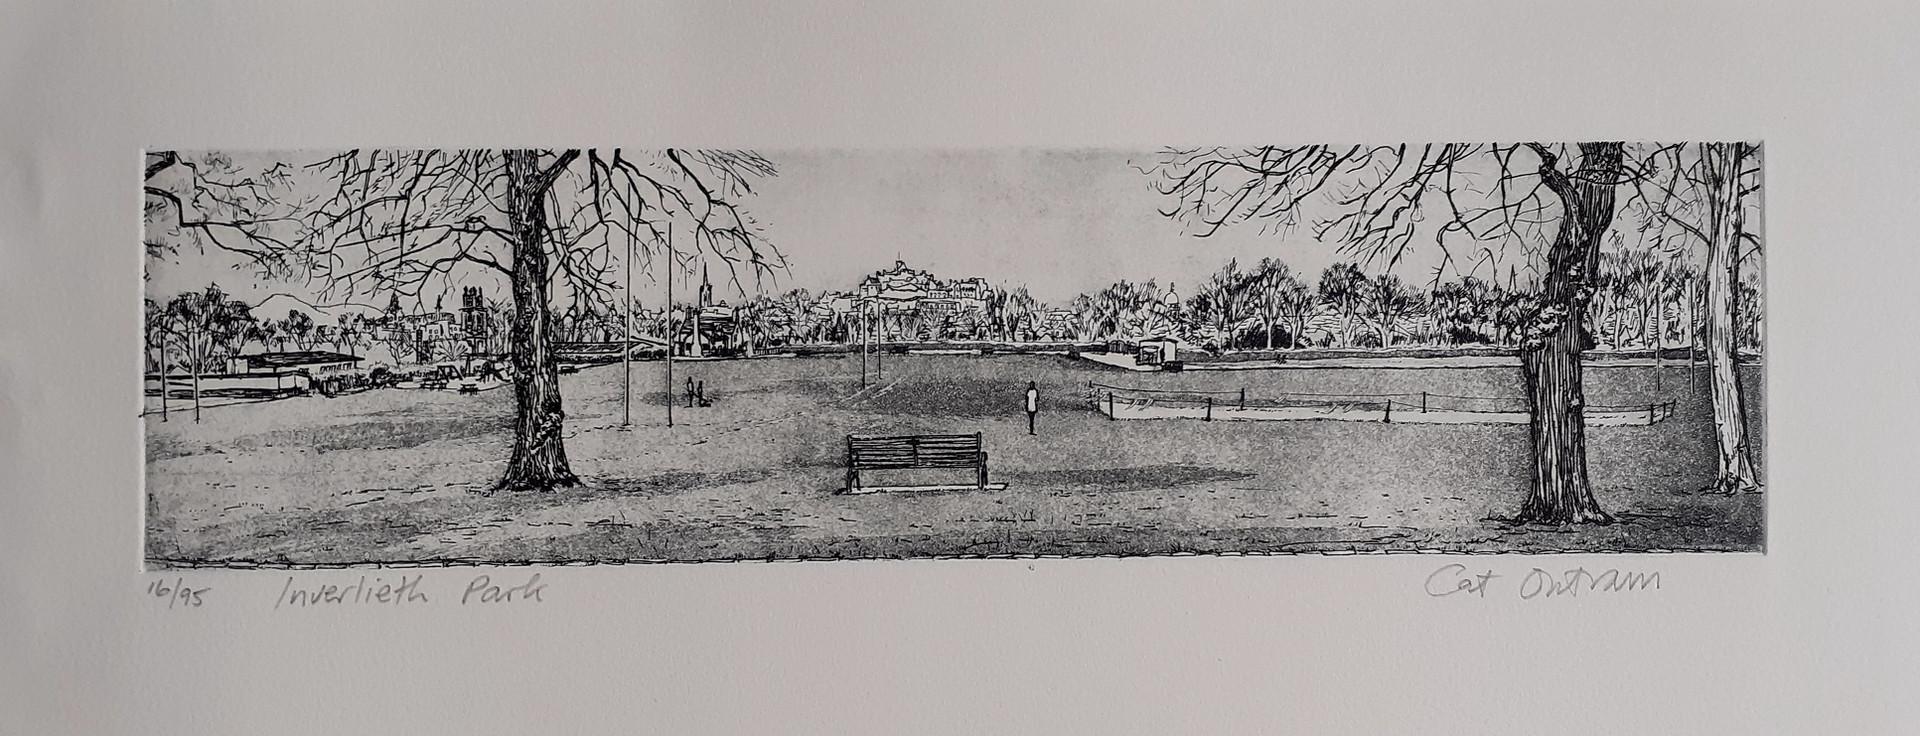 2018 Inverleith Park, 16/95